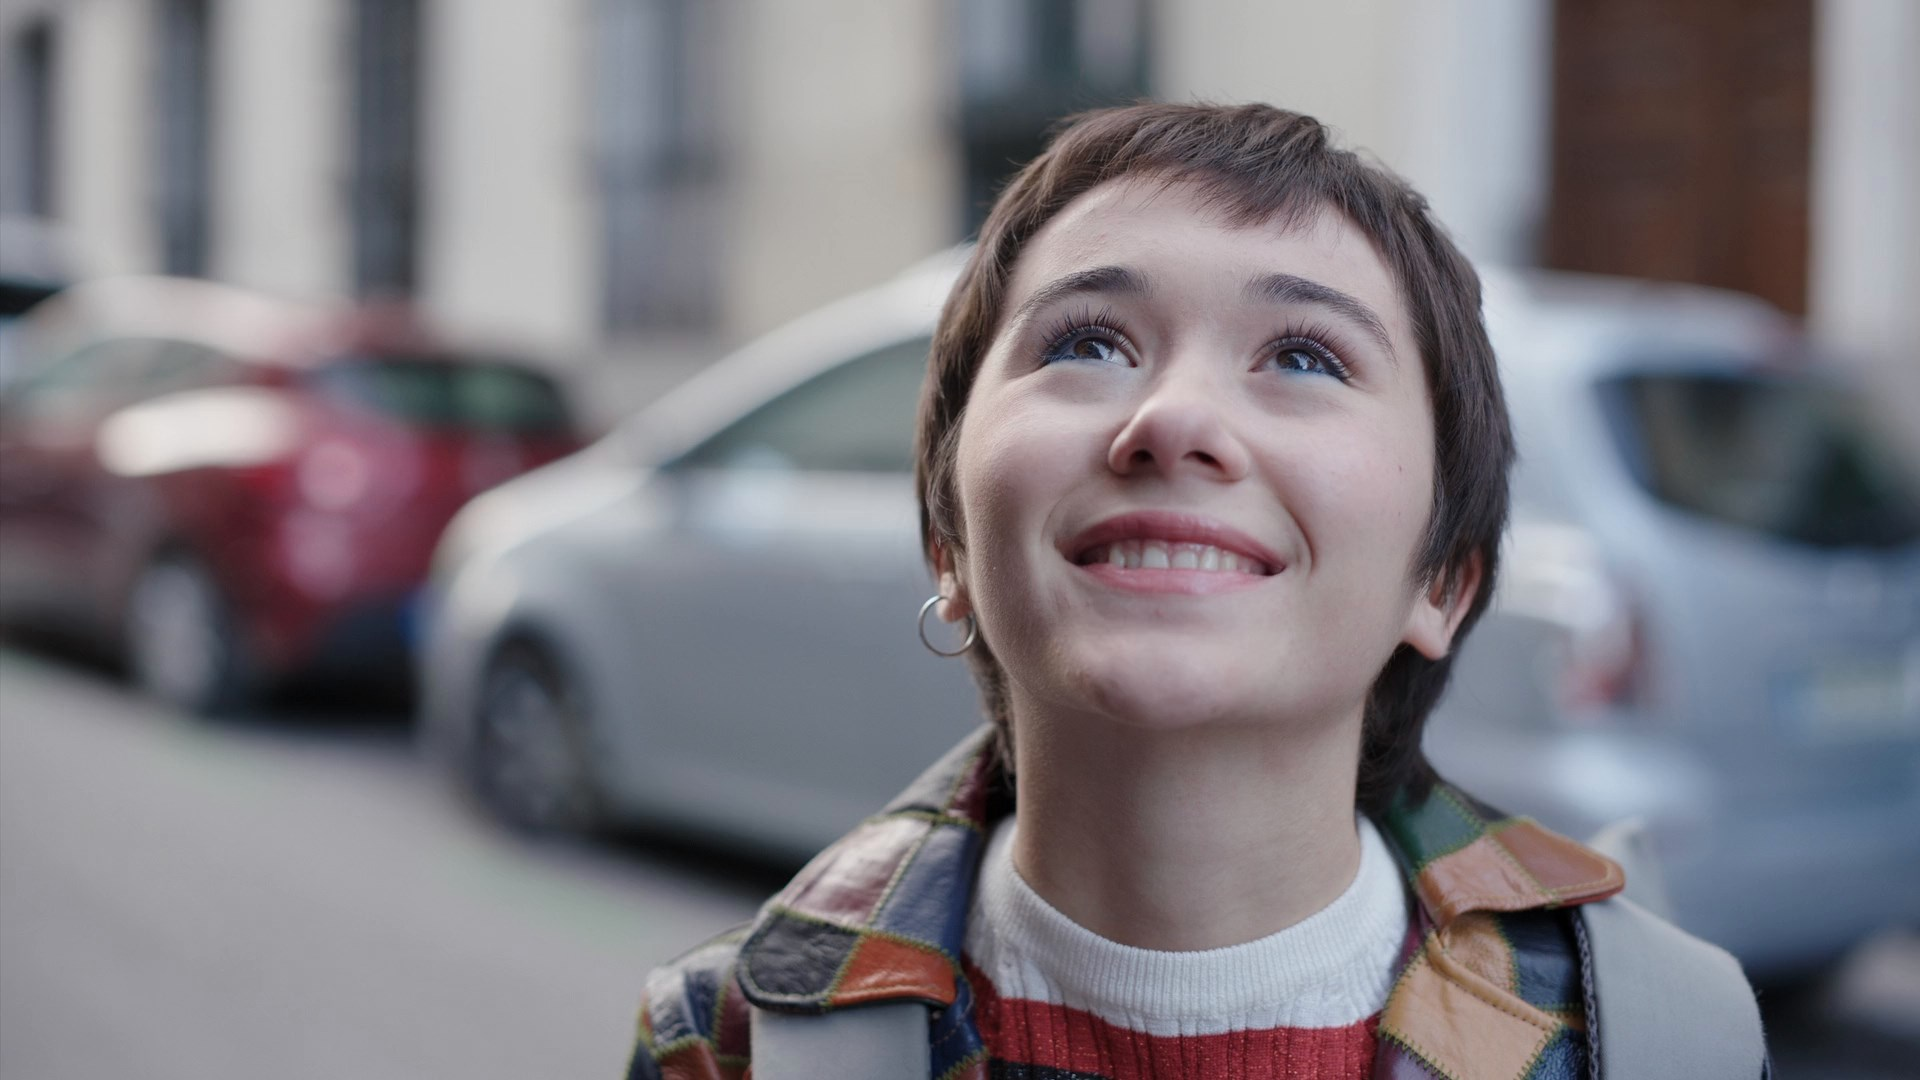 Besos al aire Temporada 1 (2021) 1080p WEB-DL